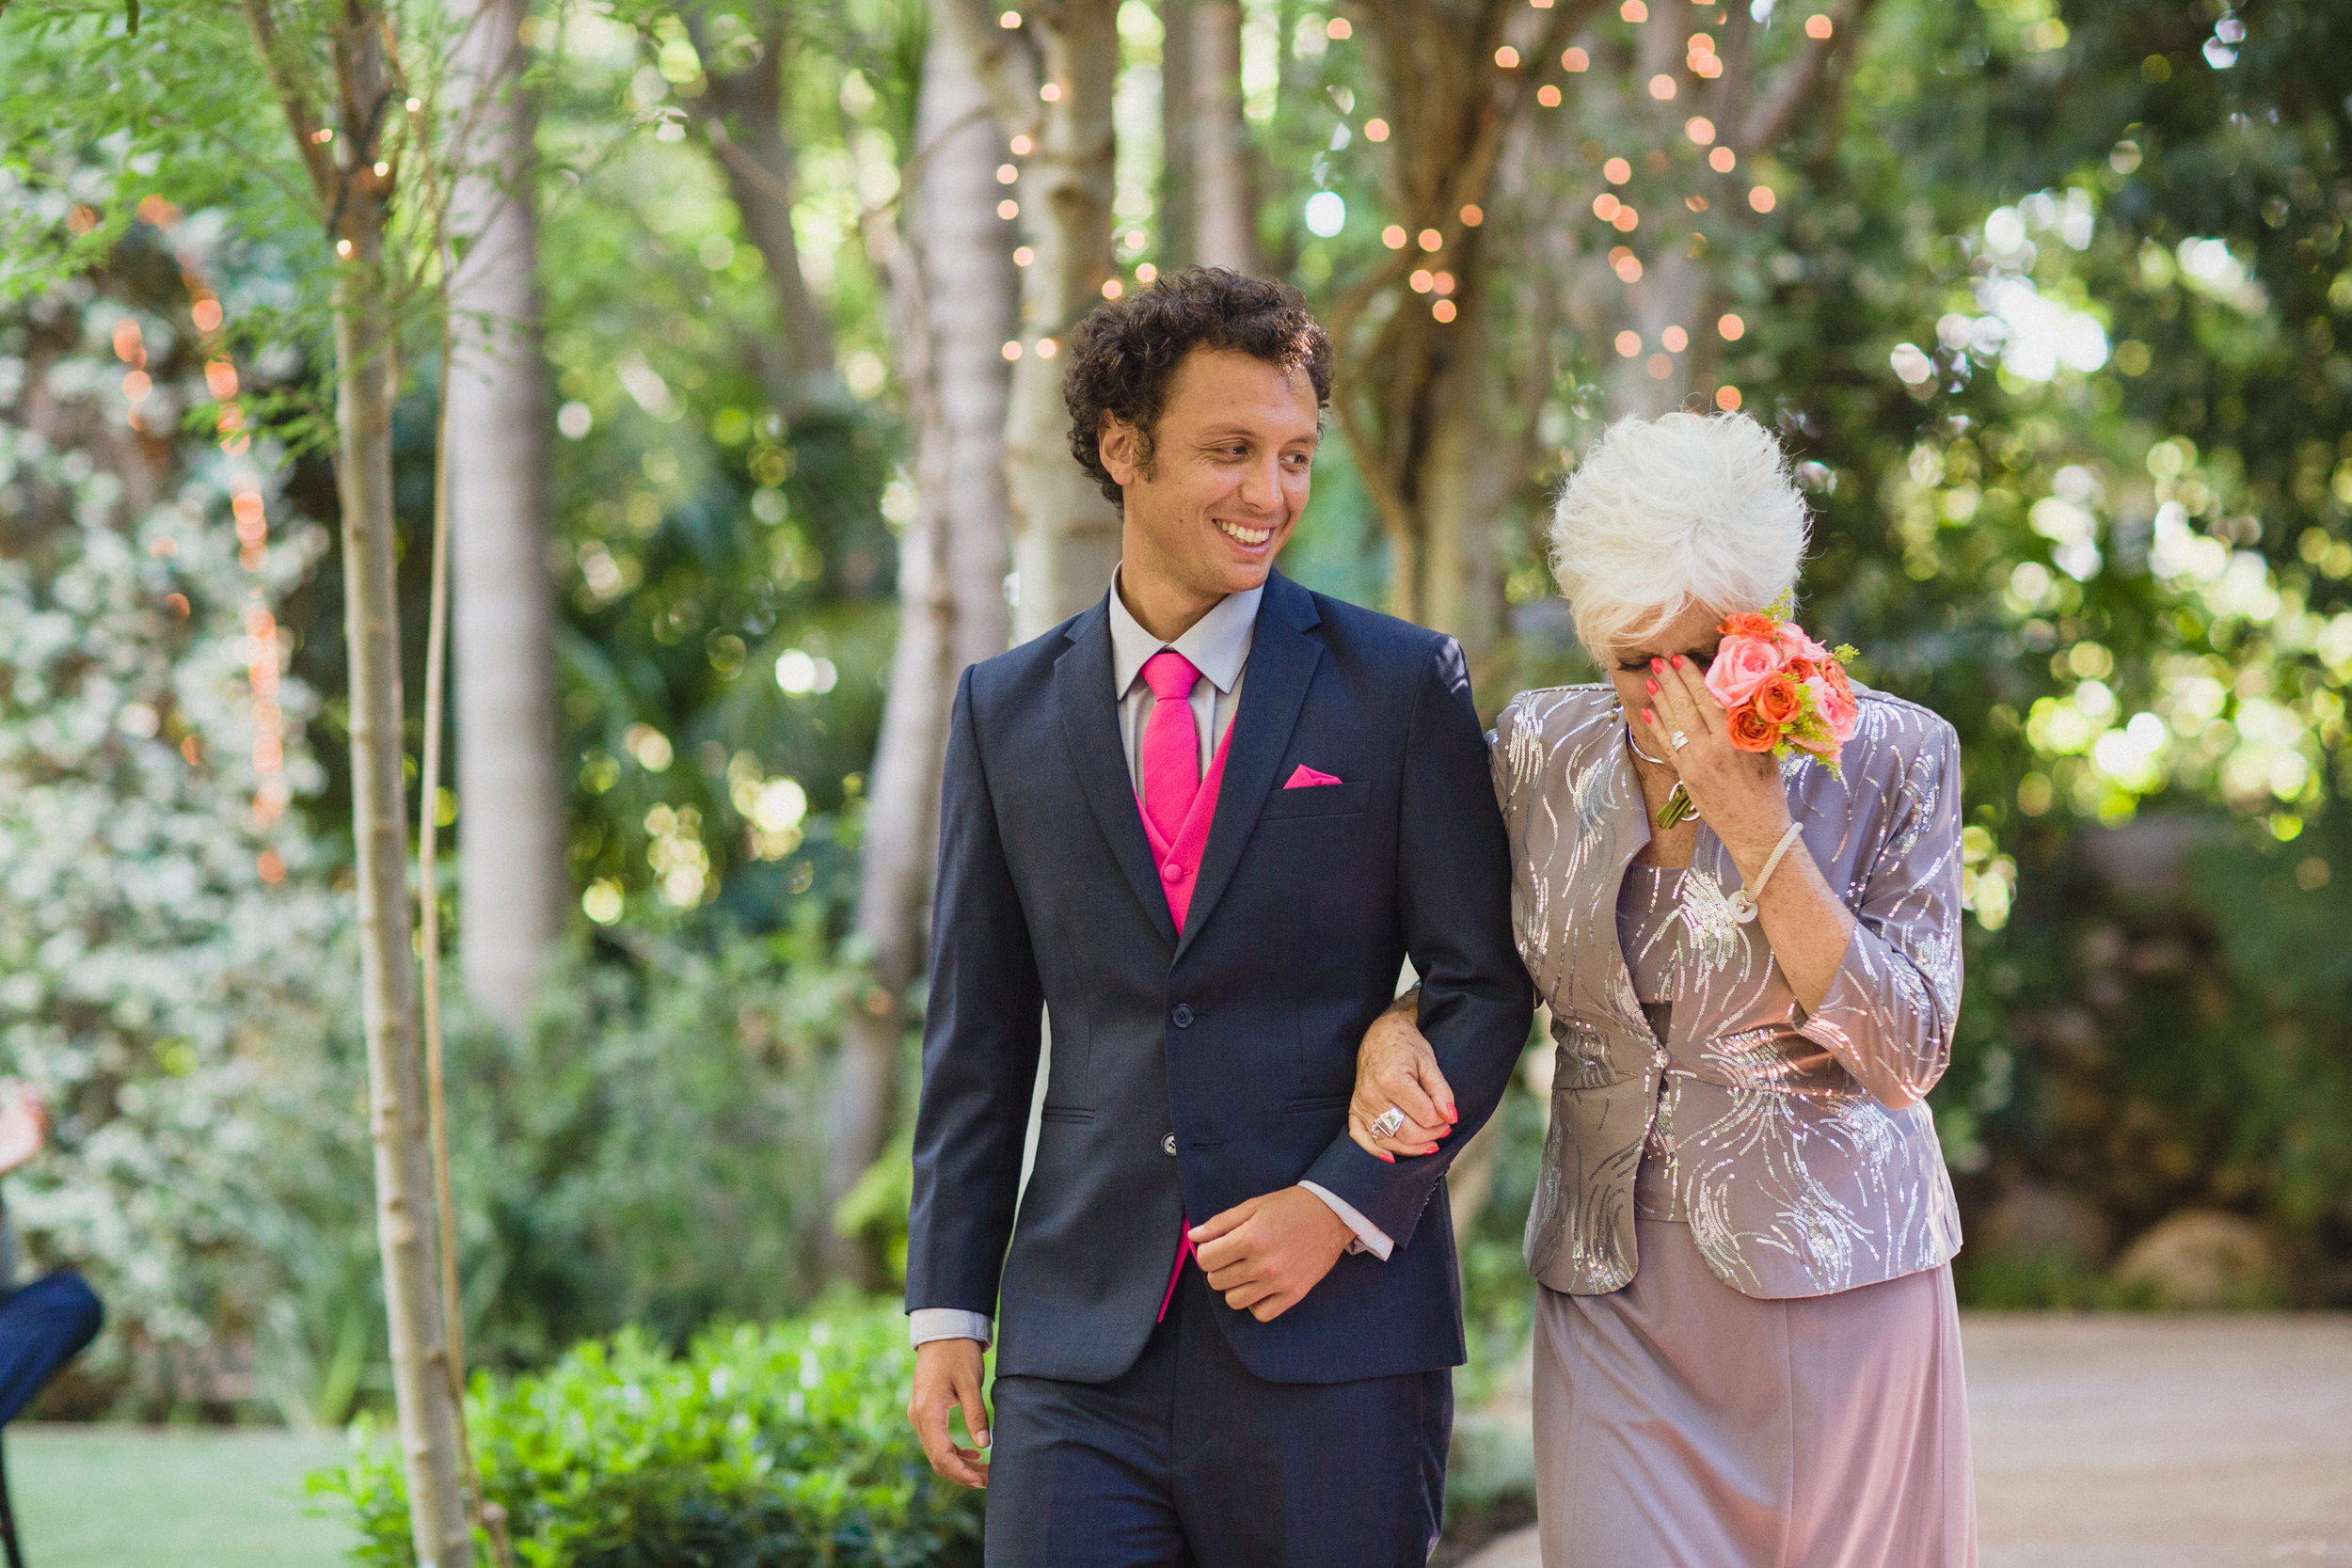 044 Hartley Botanica Wedding Photography Cotton Love Studios.jpg